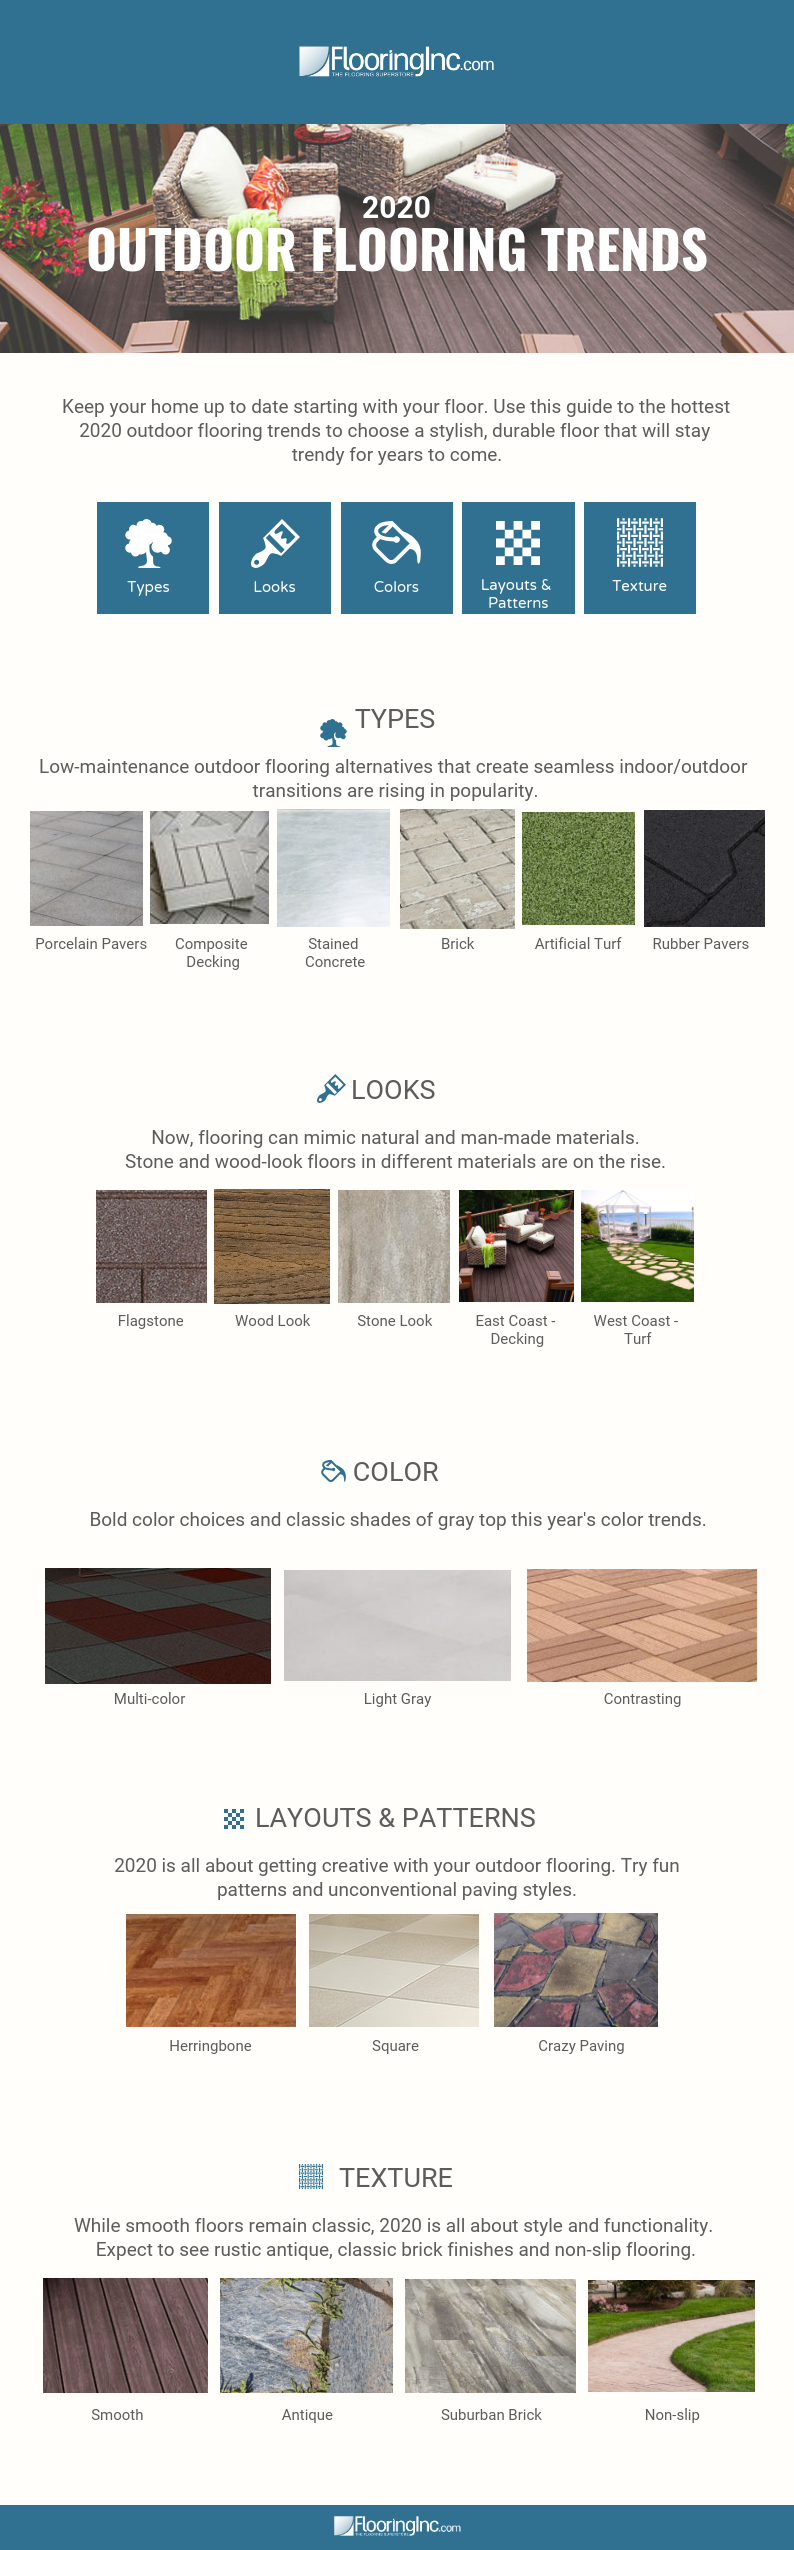 FlooringInc 2020 outdoor flooring trends